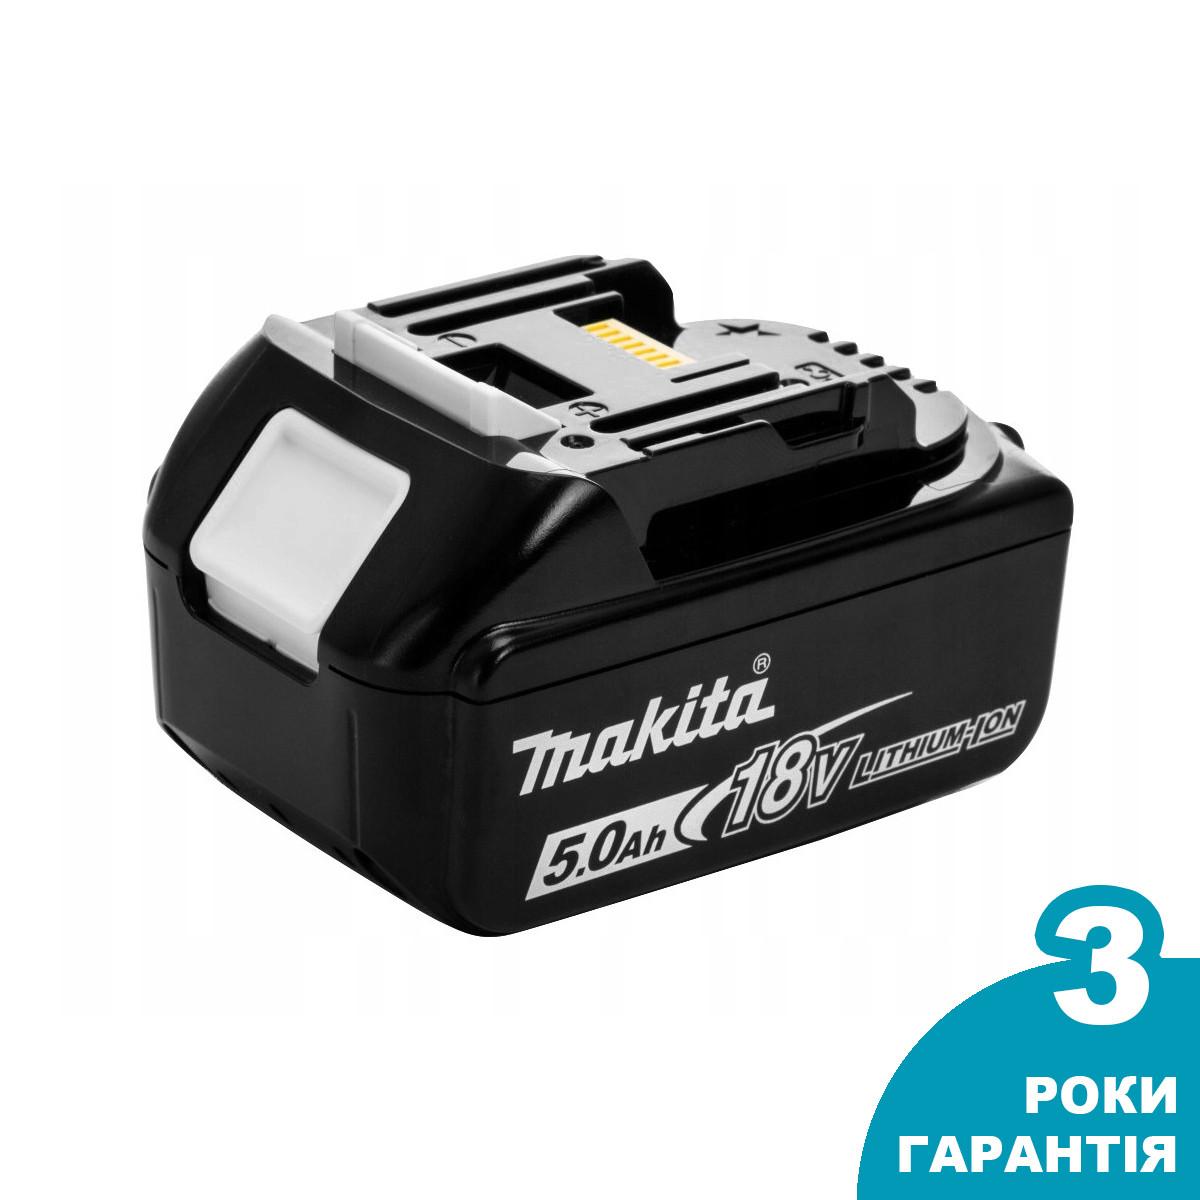 Makita Акумулятор Li-ion 18 5,0 Ah BL1850B